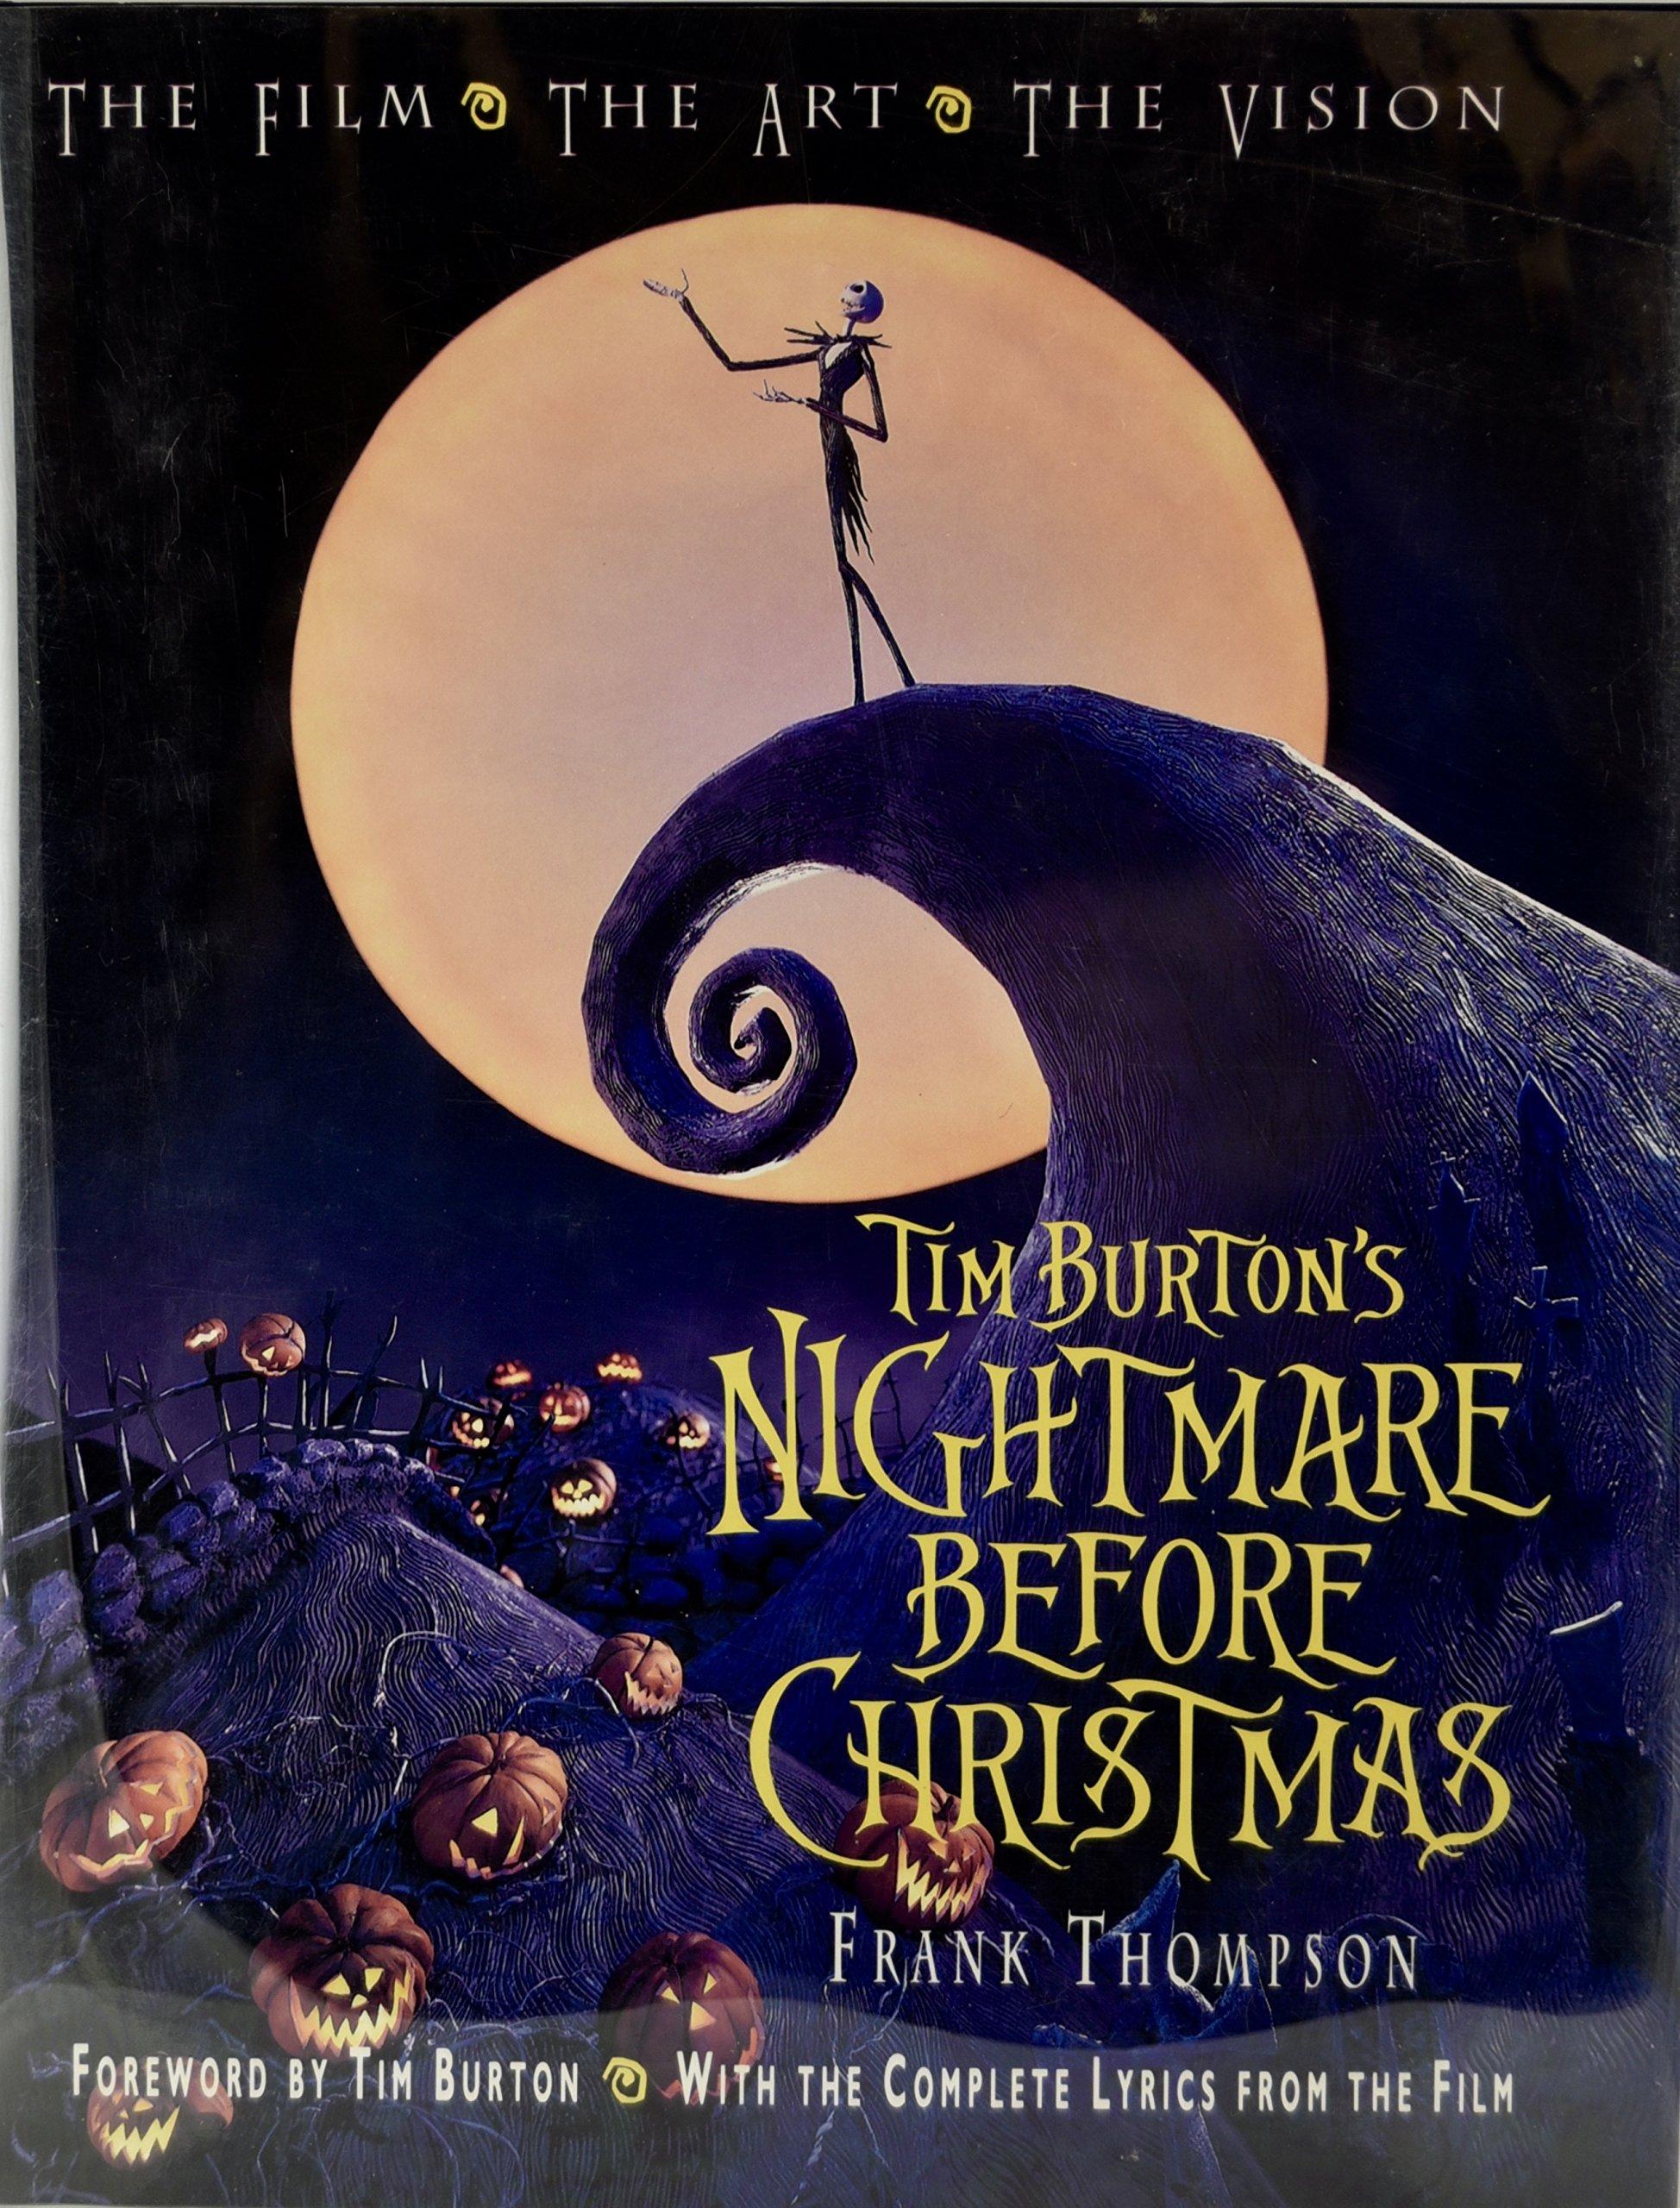 Tim Burton's Nightmare Before Christmas: The Film - The Art - The Vision  Disney Editions Deluxe Film: Amazon.de: Frank Thompson: Fremdsprachige  Bücher